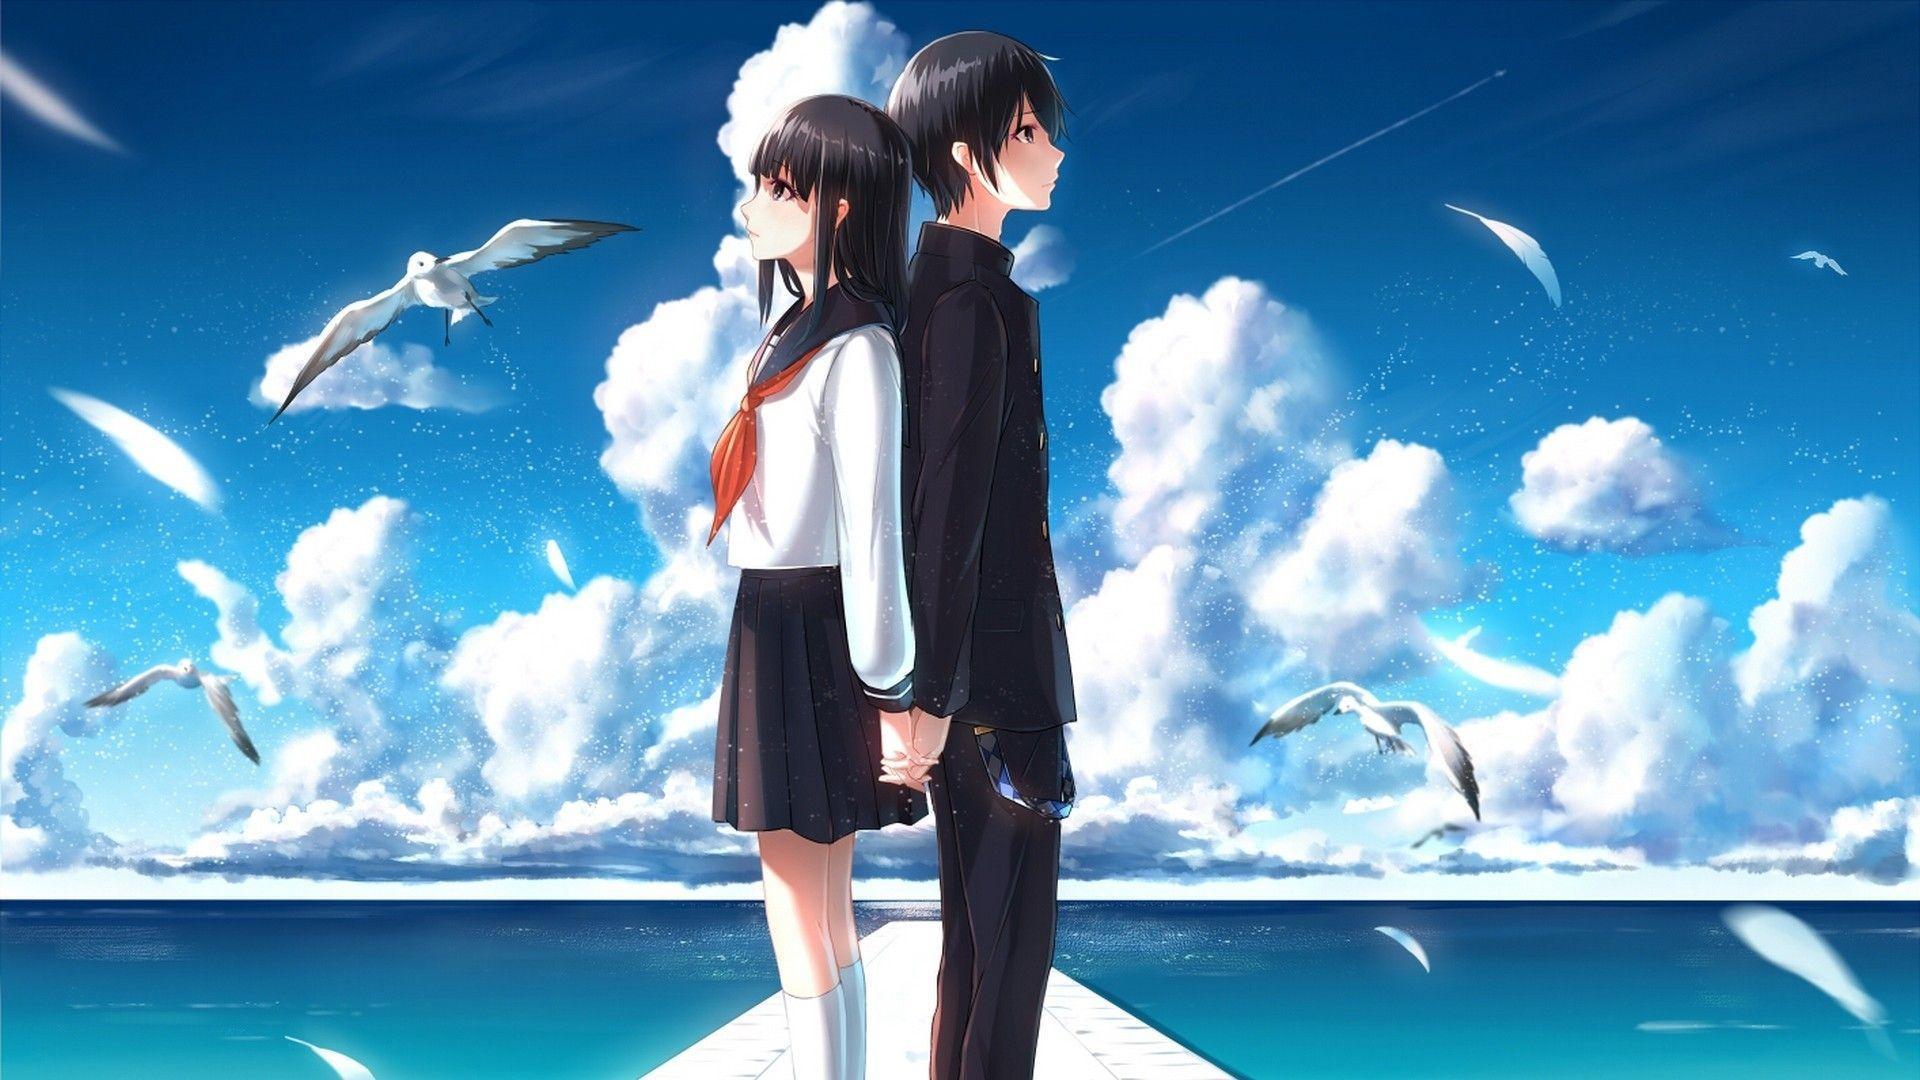 450+ Foto Wallpaper Anime Romantis Terbaru